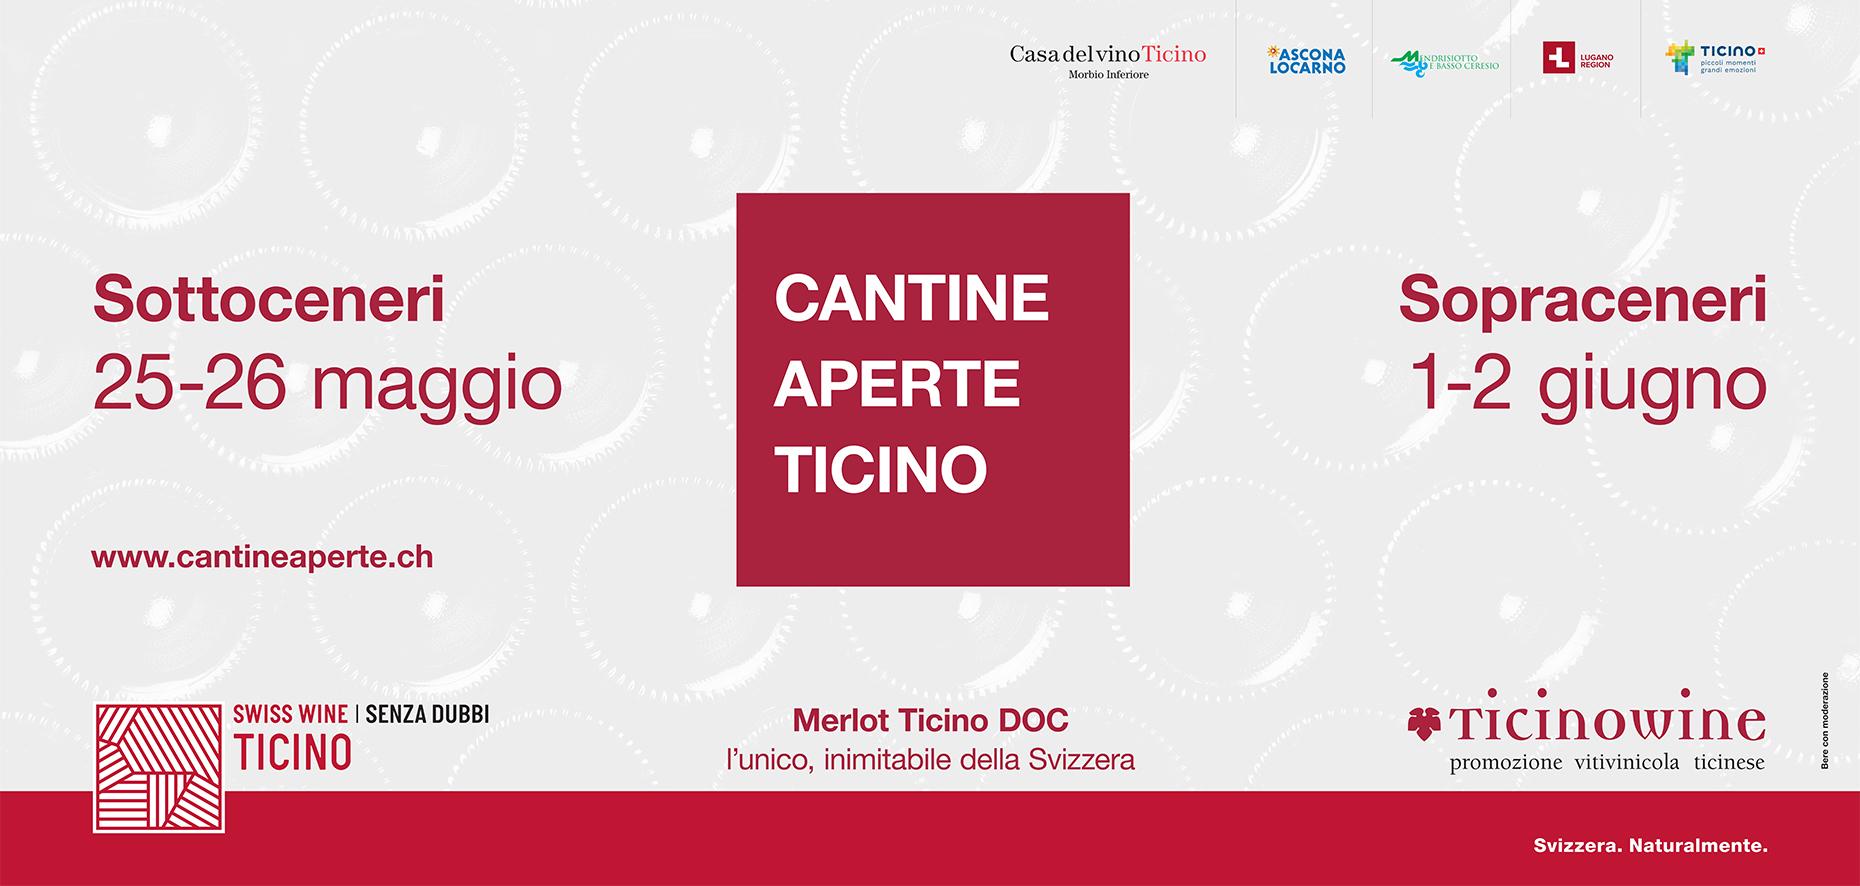 Calendario 2020 Ticino.Cantine Aperte 2019 Ticinowine